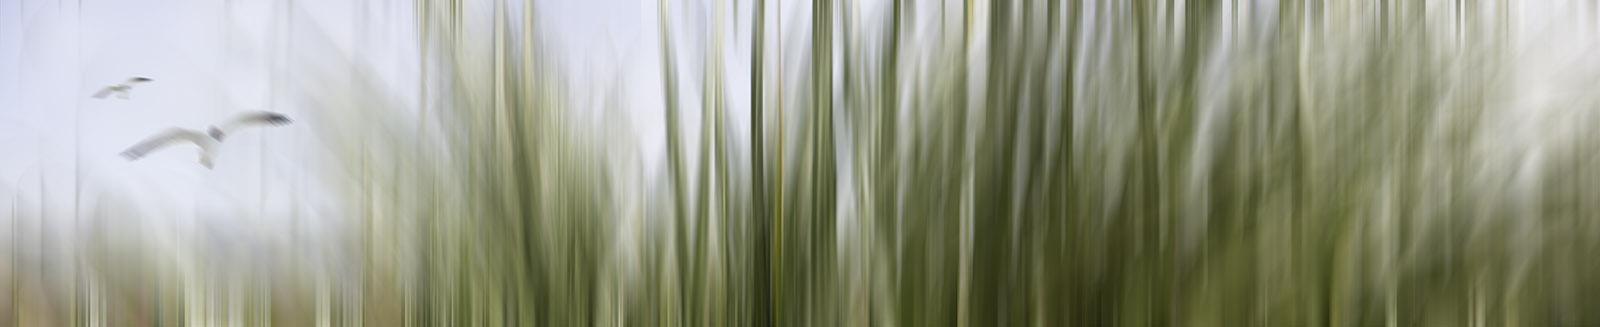 'BEACH GRASSES' printed image on glass splashback